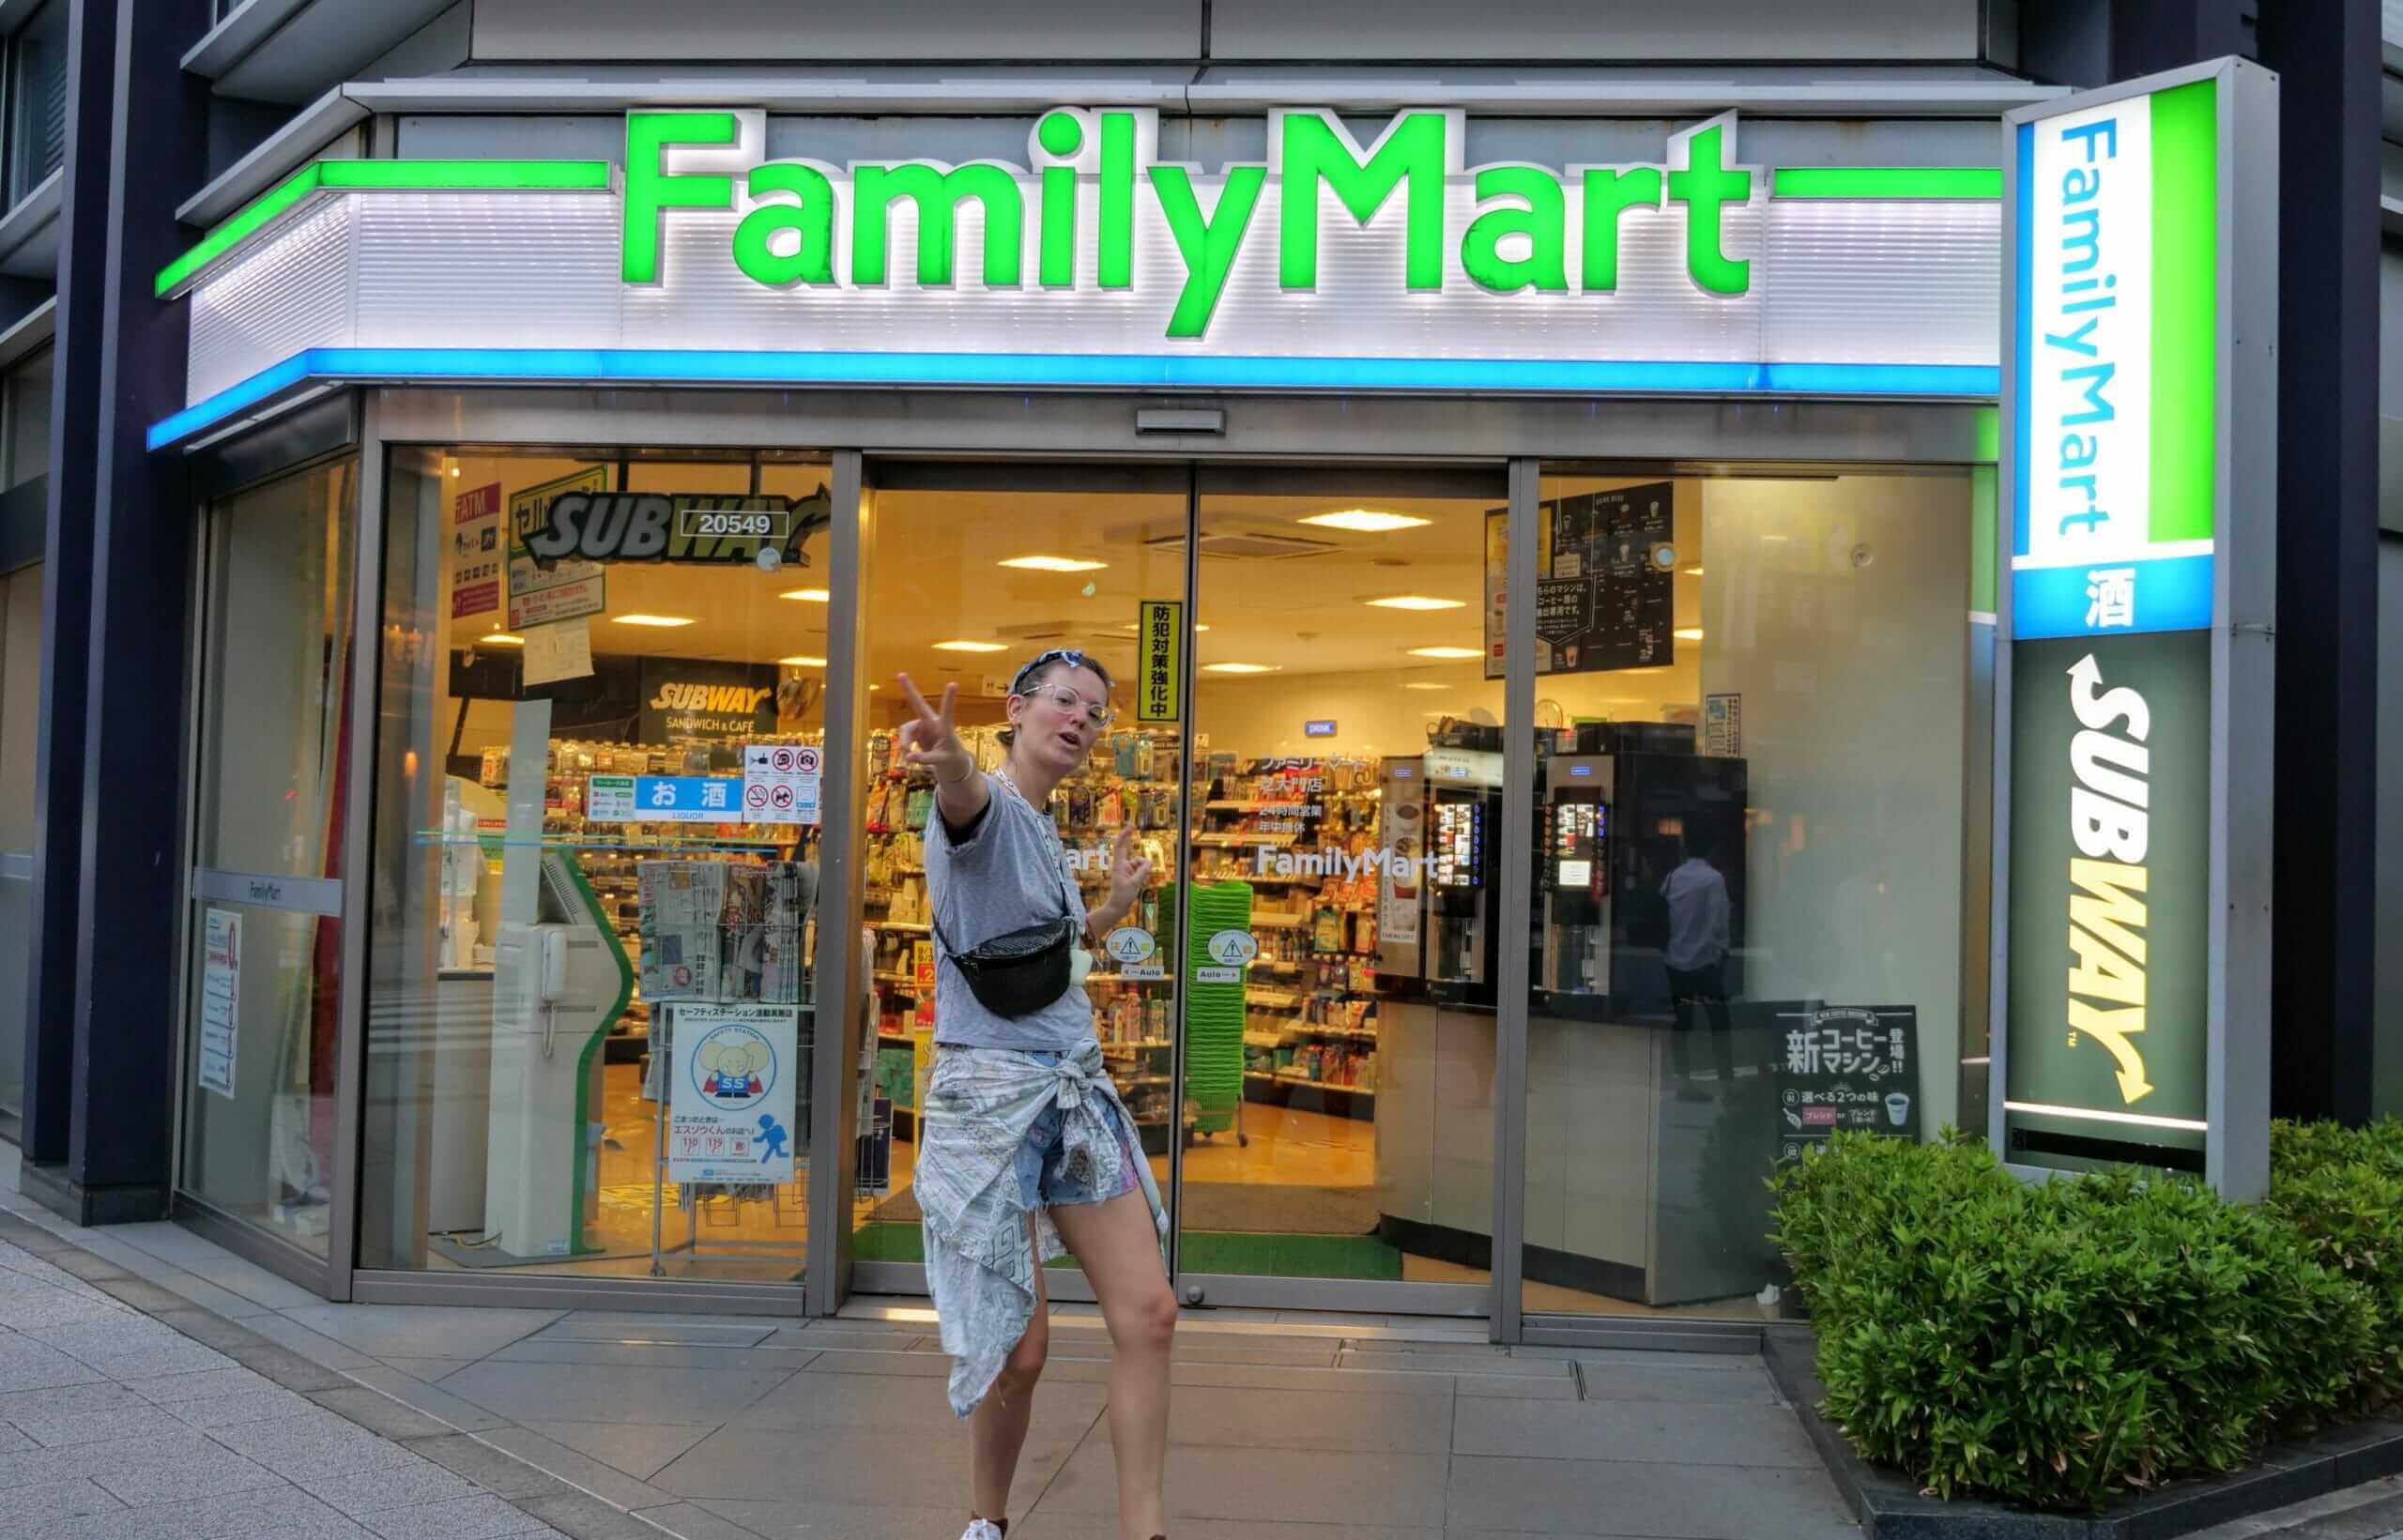 FamilyMart convenience store in Japan